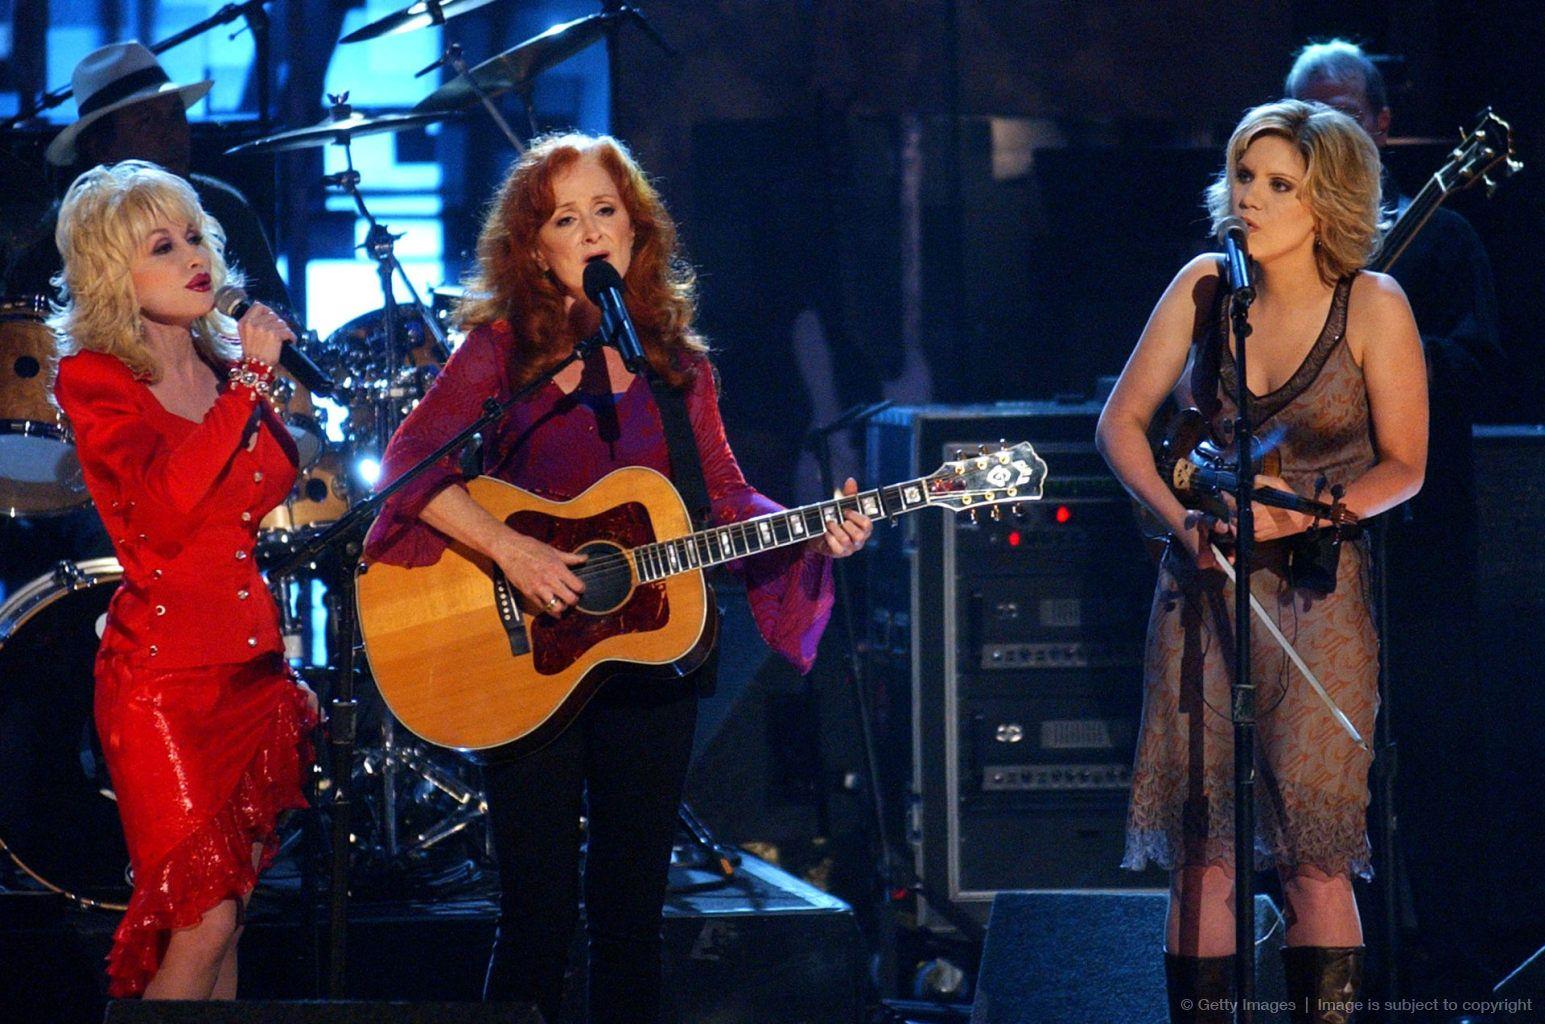 Dolly Parton Bonnie Raitt And Alison Krauss Bonnie Raitt Dolly Parton Famous Musicians